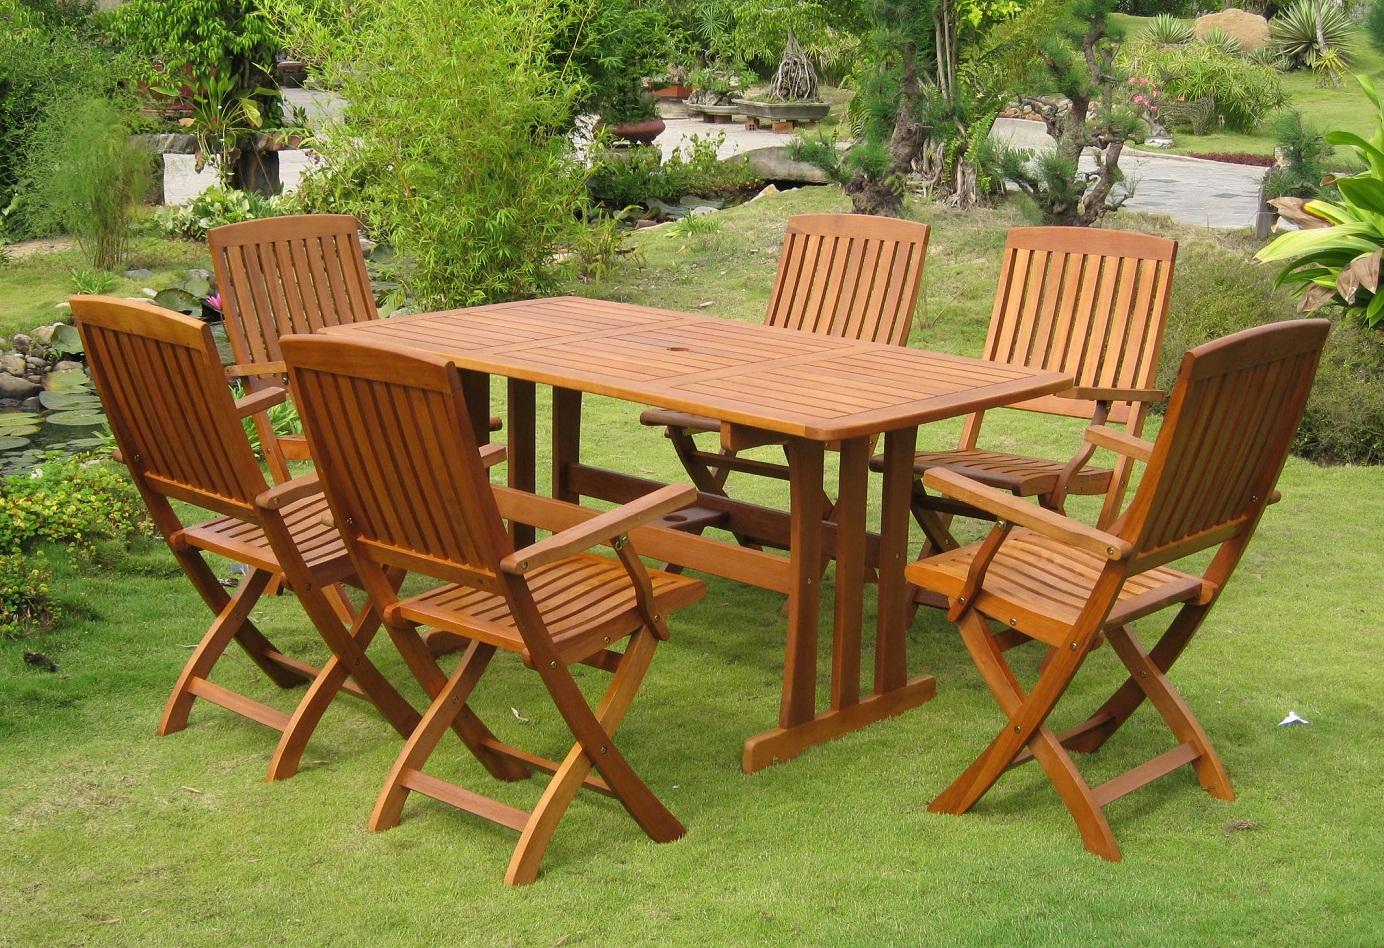 Wooden garden furniture Wooden terrace furniture PHYDRKW